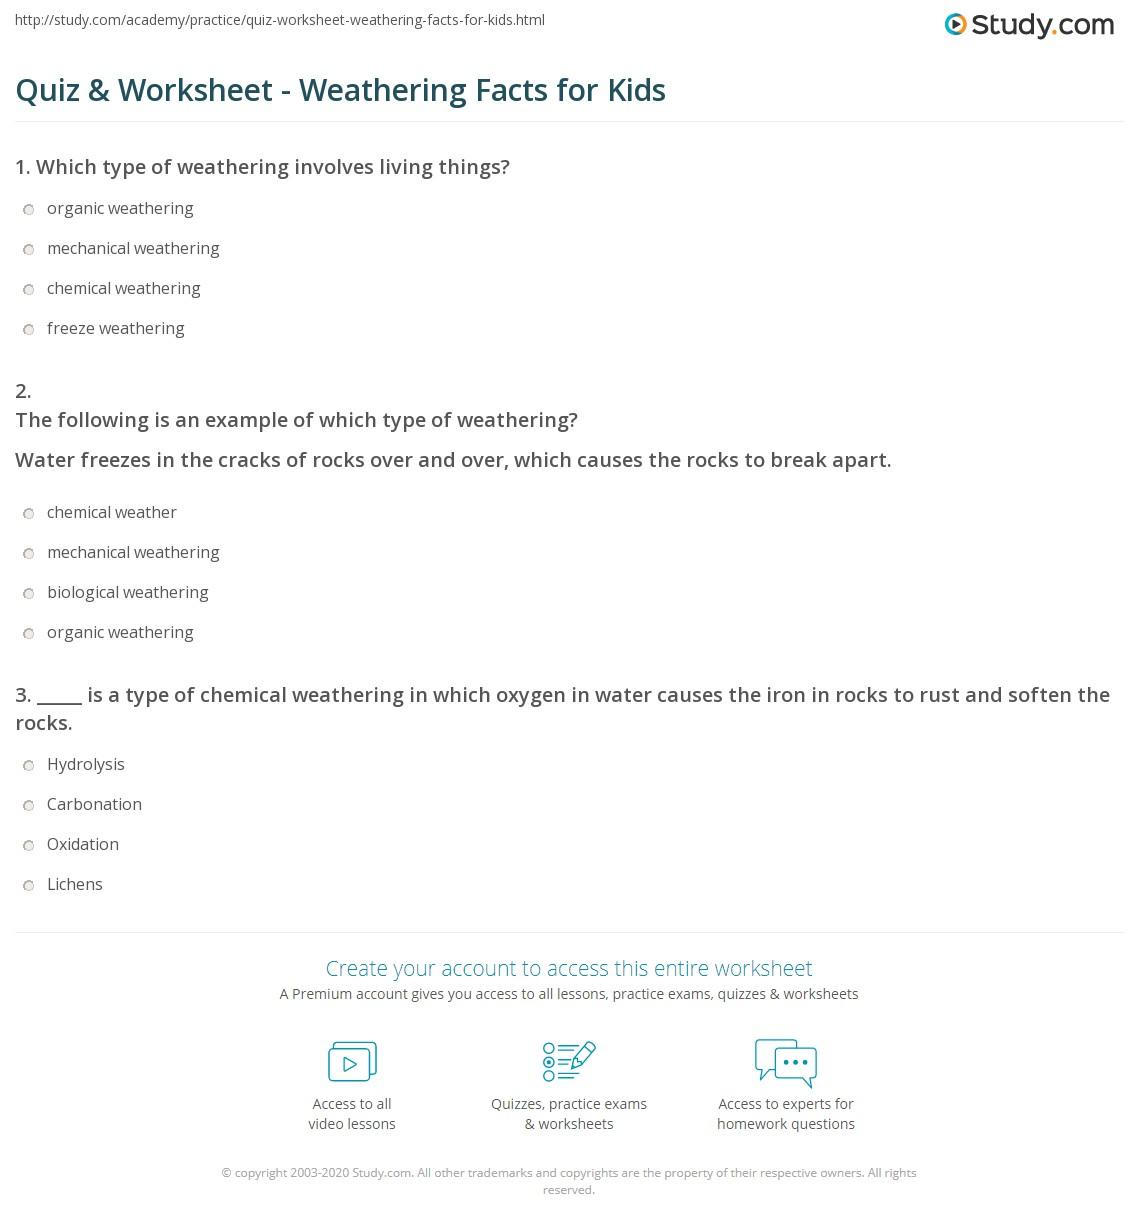 Quiz & Worksheet - Weathering Facts for Kids   Study.com